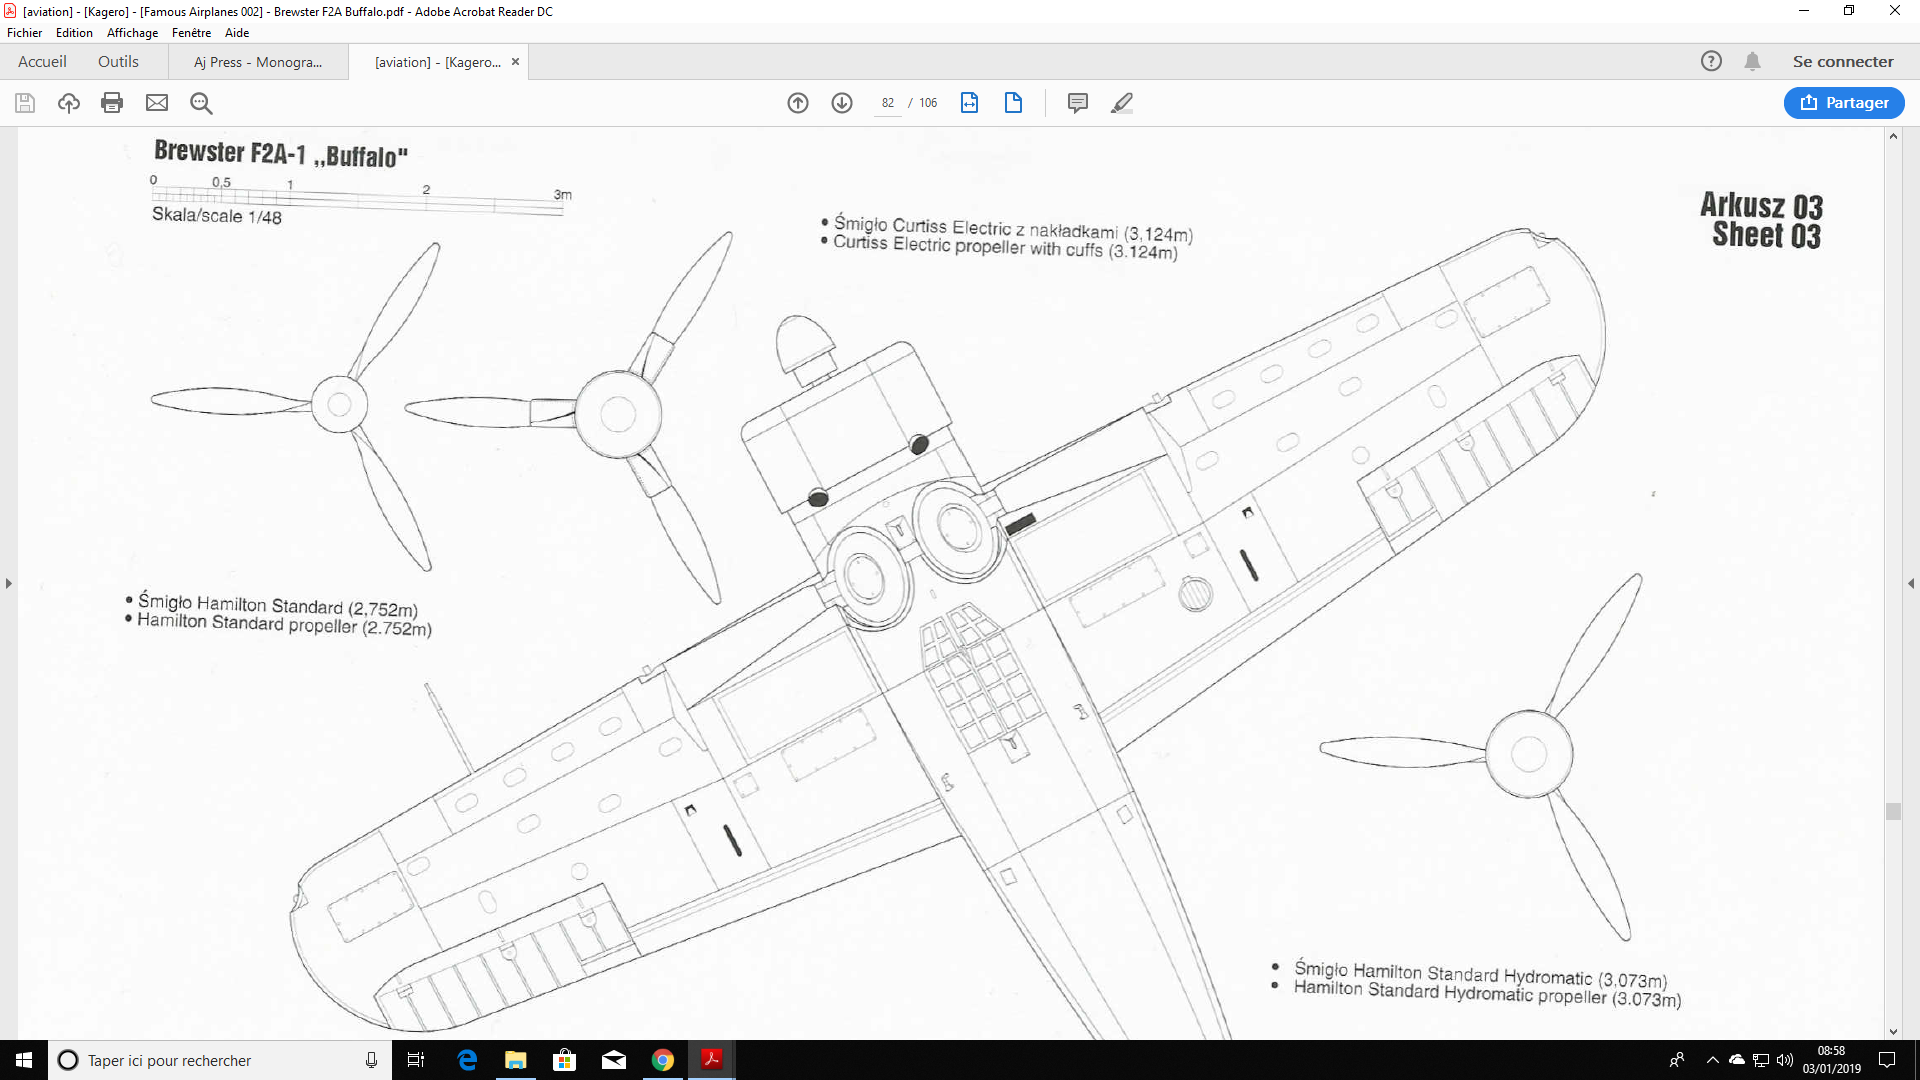 [Année AZUR] Brewster F2A-1 Buffalo Spécial Hobby 1:32 - Page 2 Captur37